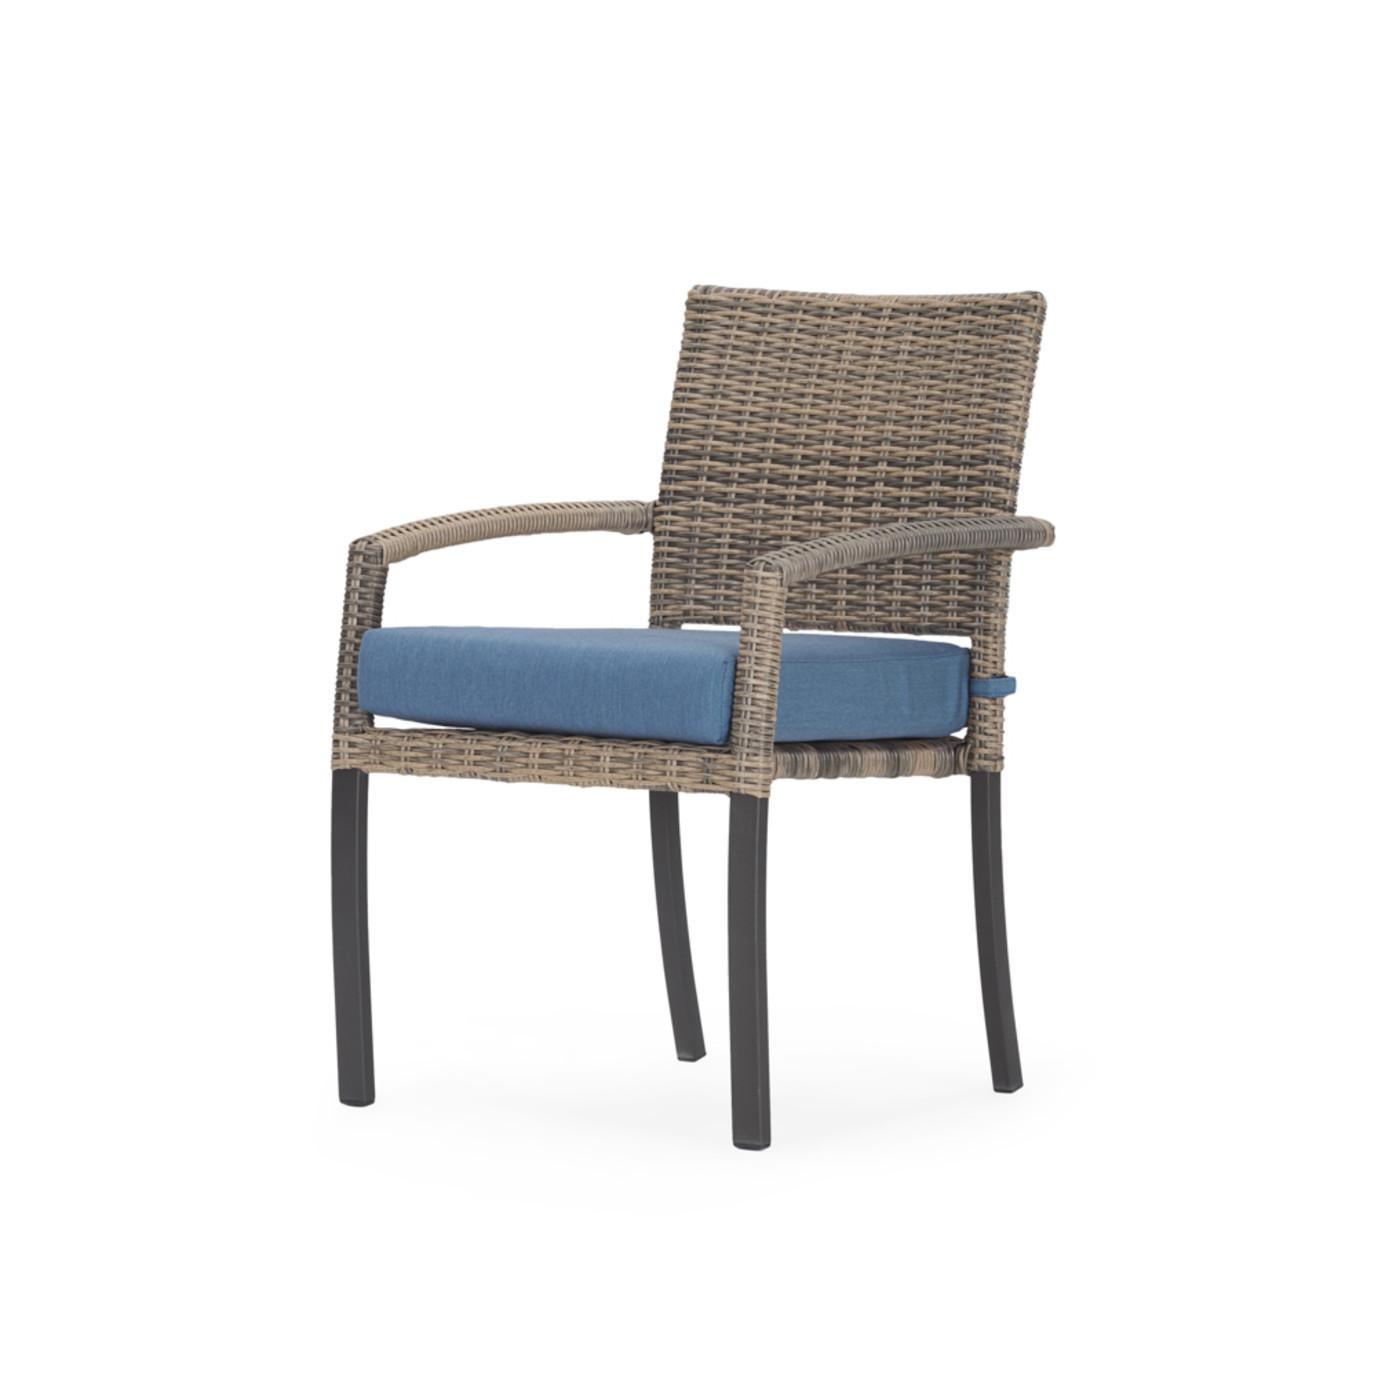 Portofino Affinity 6pc Dining Chairs